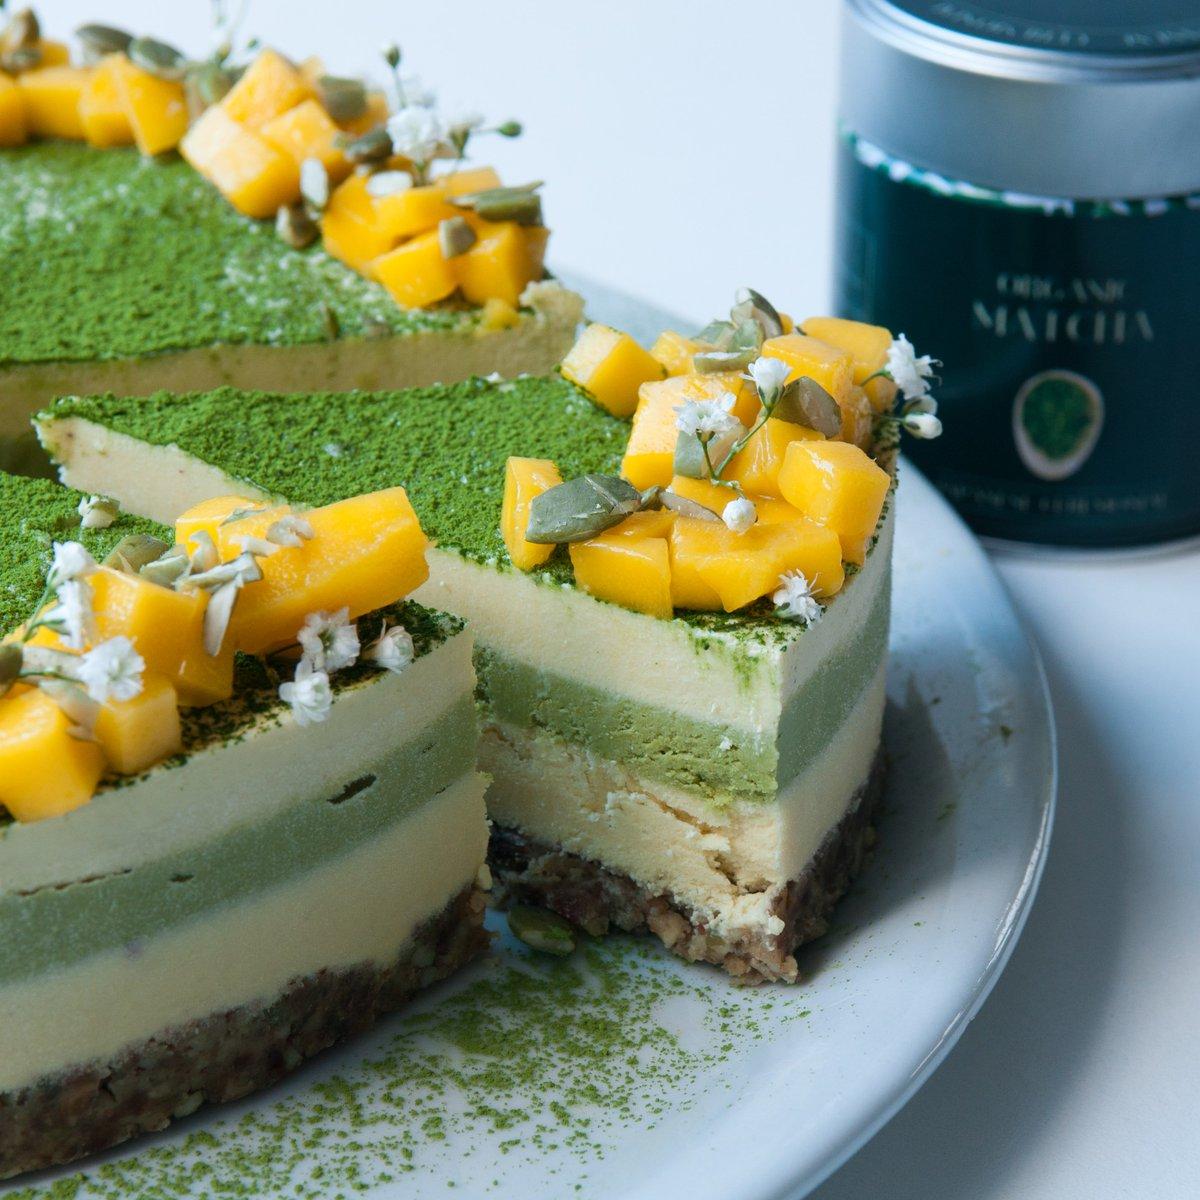 Bake your own cake with Heapwell Matcha   https://www. heapwell.co.uk/shop/?Page_ID= 3610&amp;refpid=52375&amp;id=700580 &nbsp; …   RT to win Free #Matcha  #London #MatchaTea #healthyfood #vegetarian #Organic #Vegan #Health #Japan #greentea #breakfast #vegancooking #Food #coffee #tea #recipe #yoga #抹茶<br>http://pic.twitter.com/CD5OwLj8JT